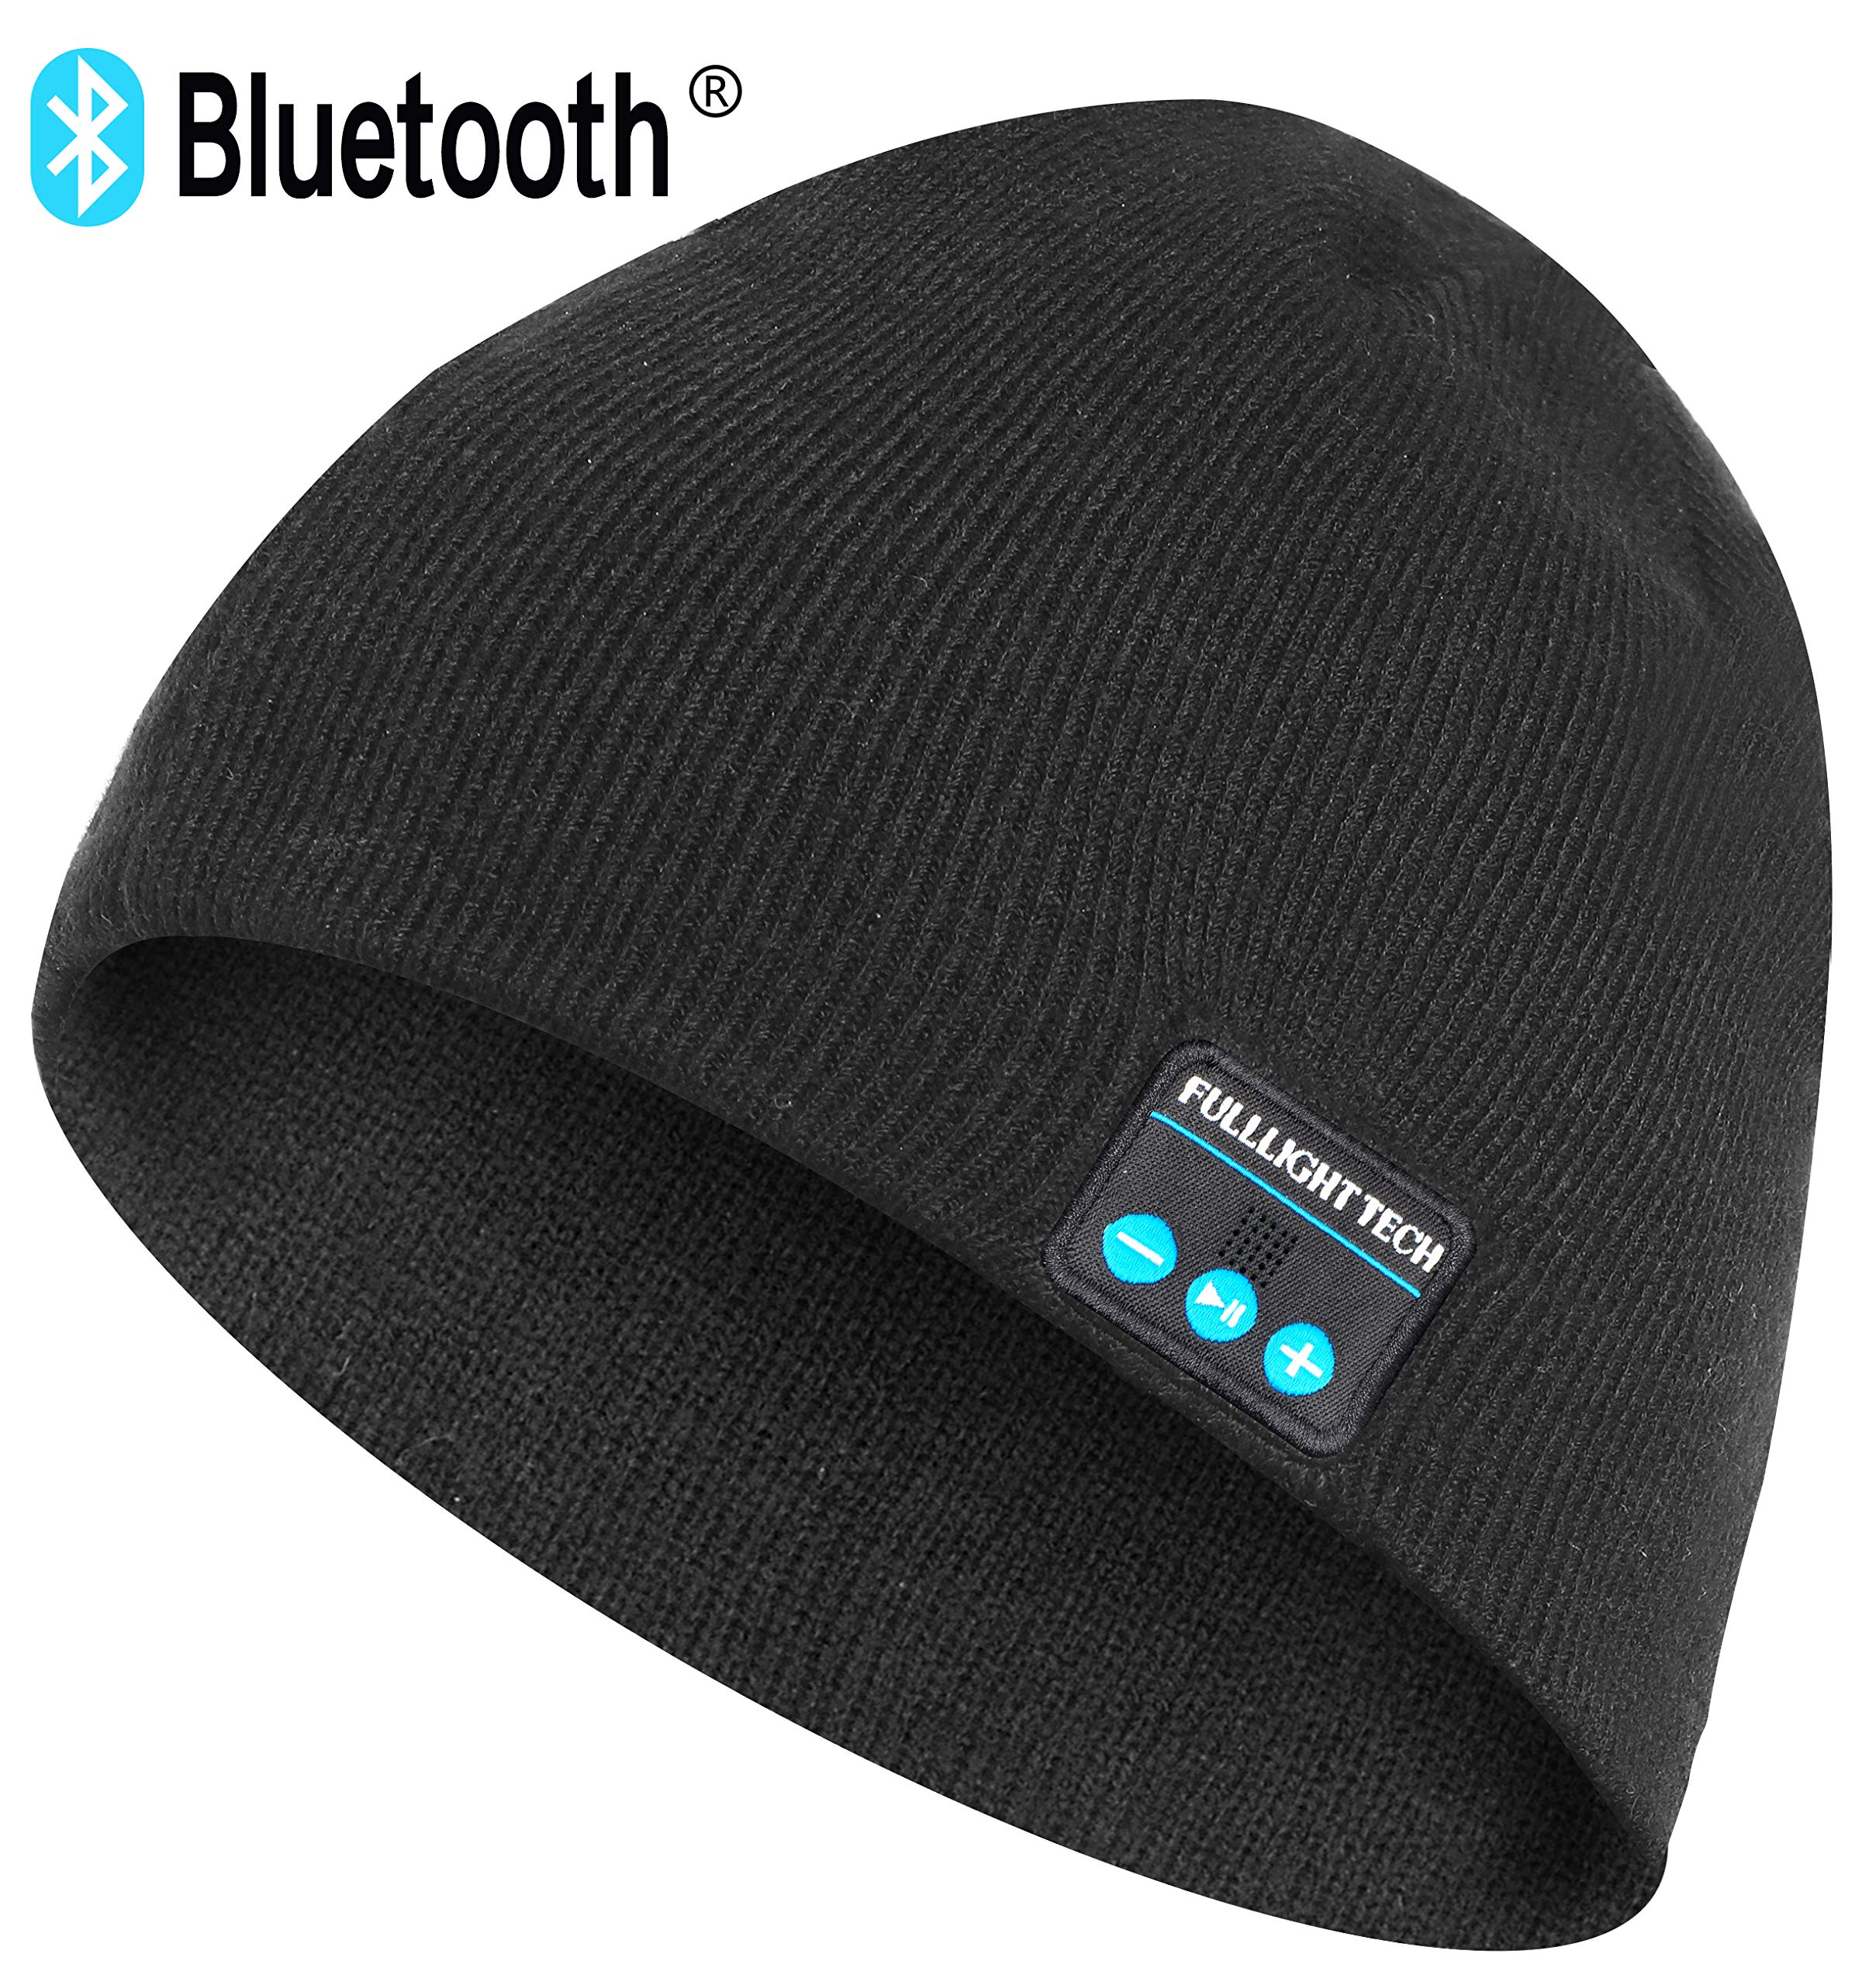 24k Gold Eye Mask Bonus Face For Men Winter Hat Wh 97 Upgraded V42 Bluetooth Beanie Headphones Wireless Headset Music Knit Cap With